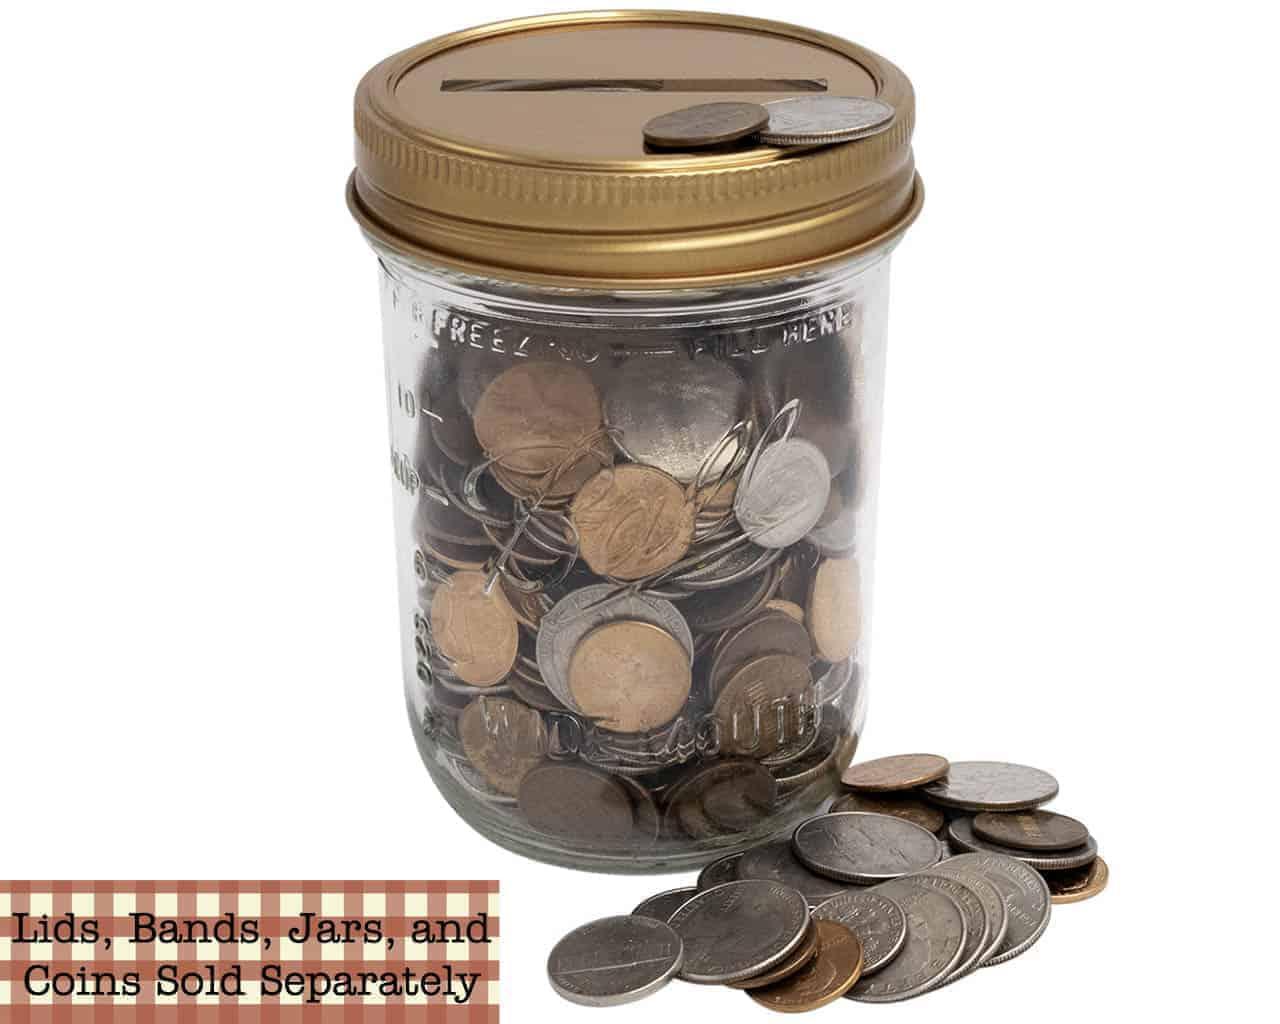 mason-jar-lifestyle-copper-coin-slot-bank-lid-insert-copper-band-wide-mouth-ball-mason-jar-coins